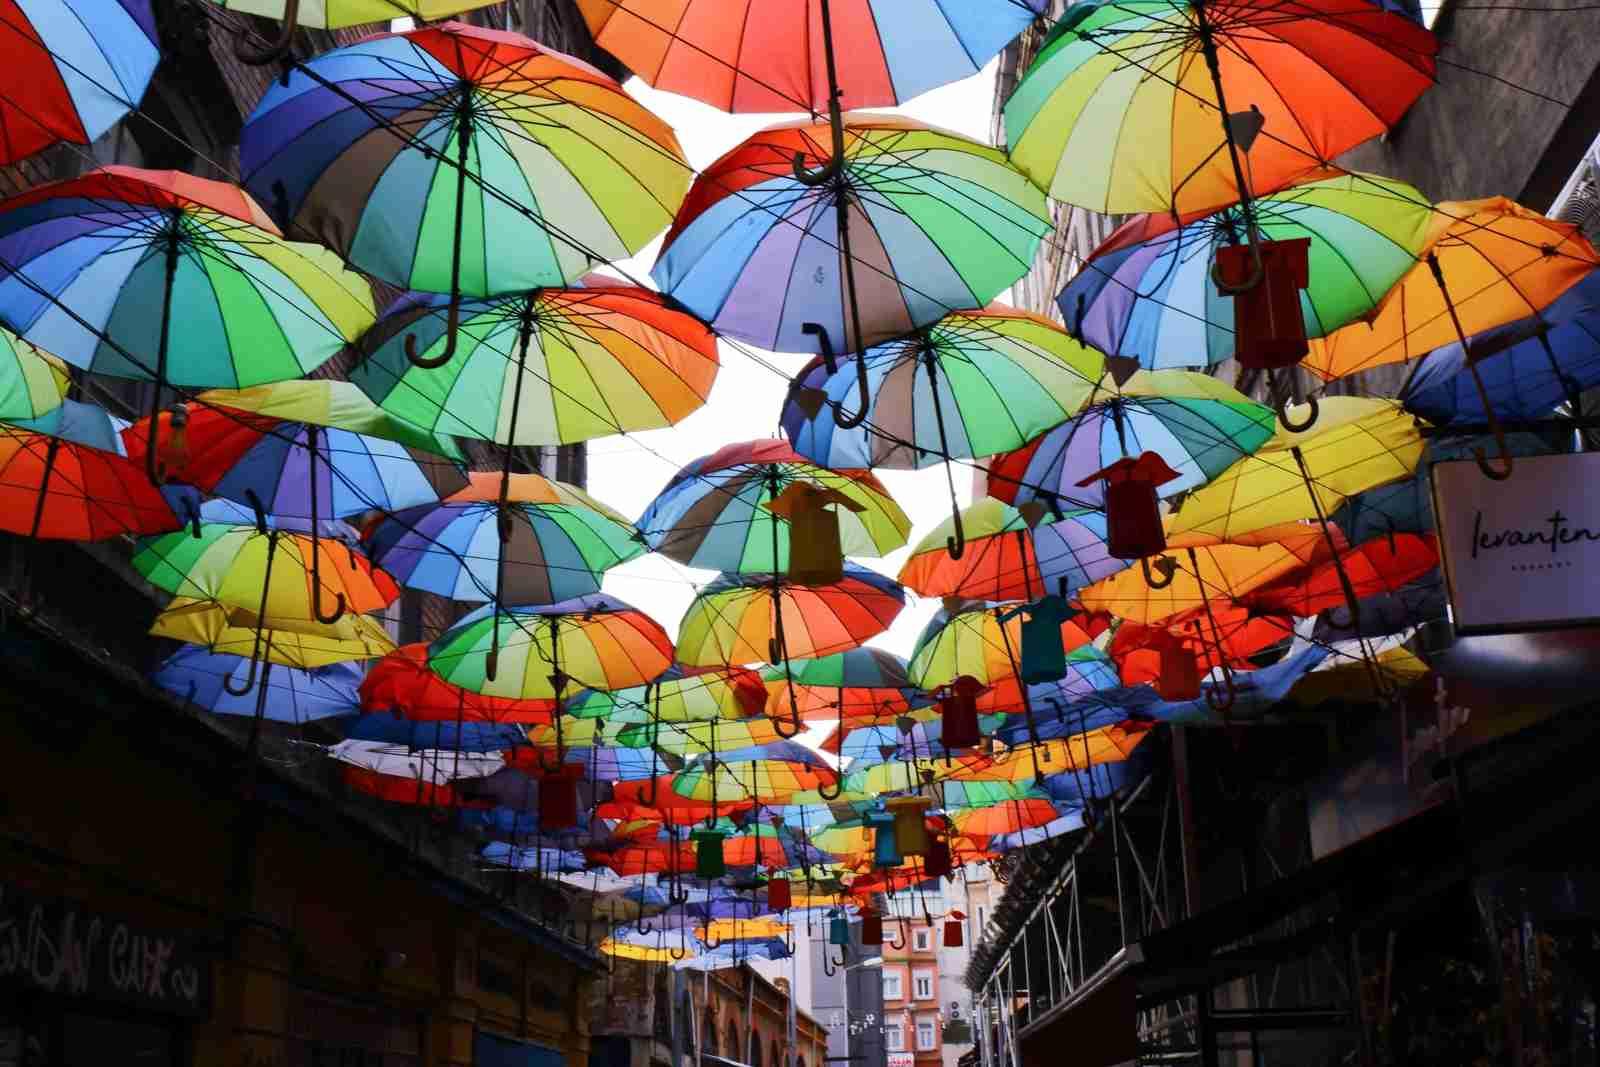 The colorful neighborhood of Karaköy in Istanbul, Turkey. (Photo by Umut Yilman/Unsplash)